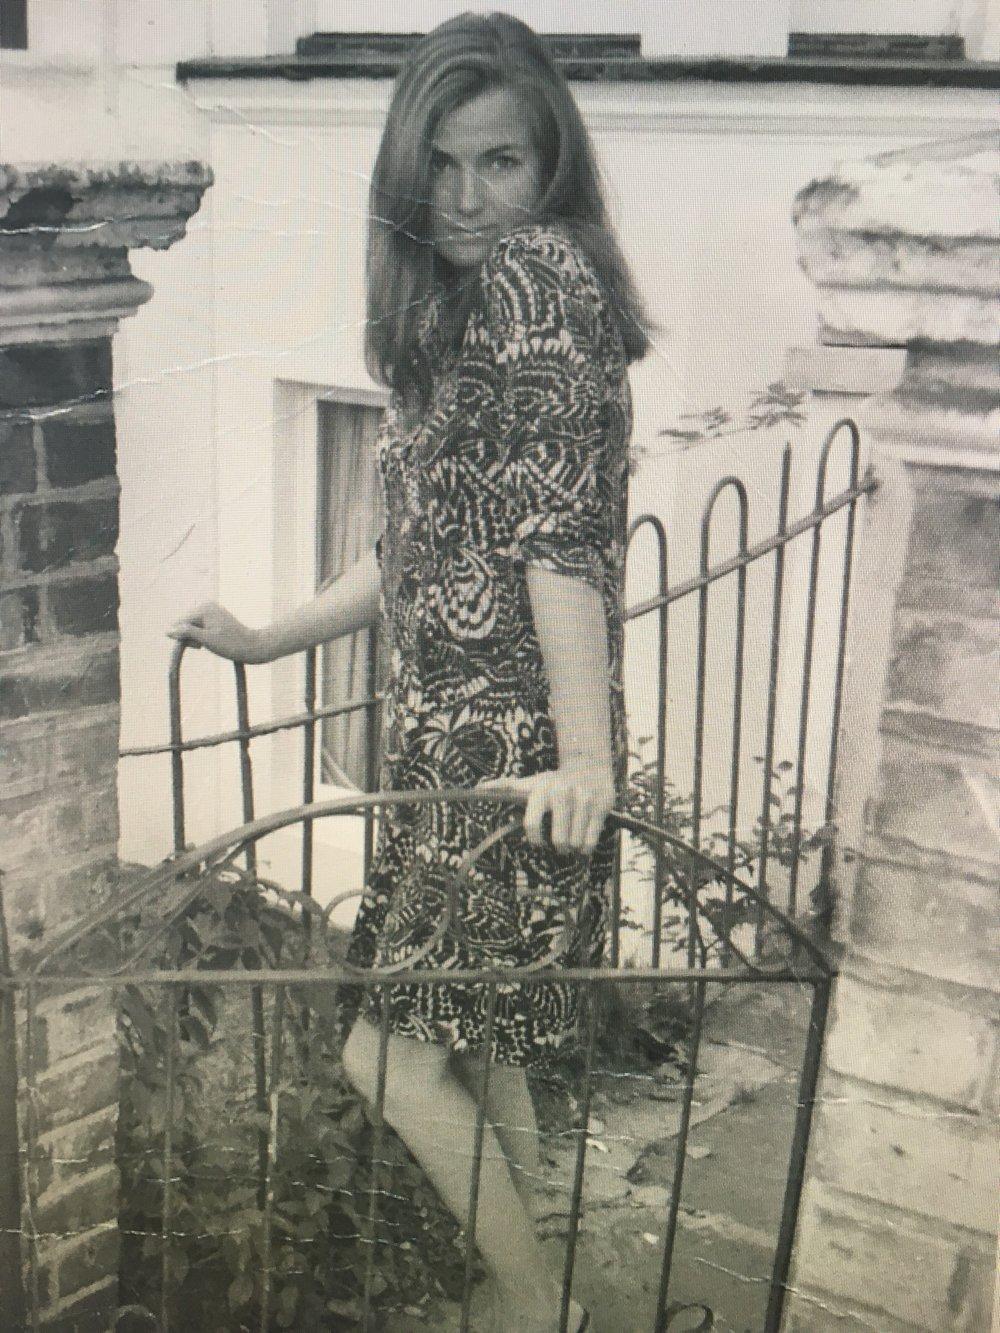 Jean Kilbourne, circa 1967